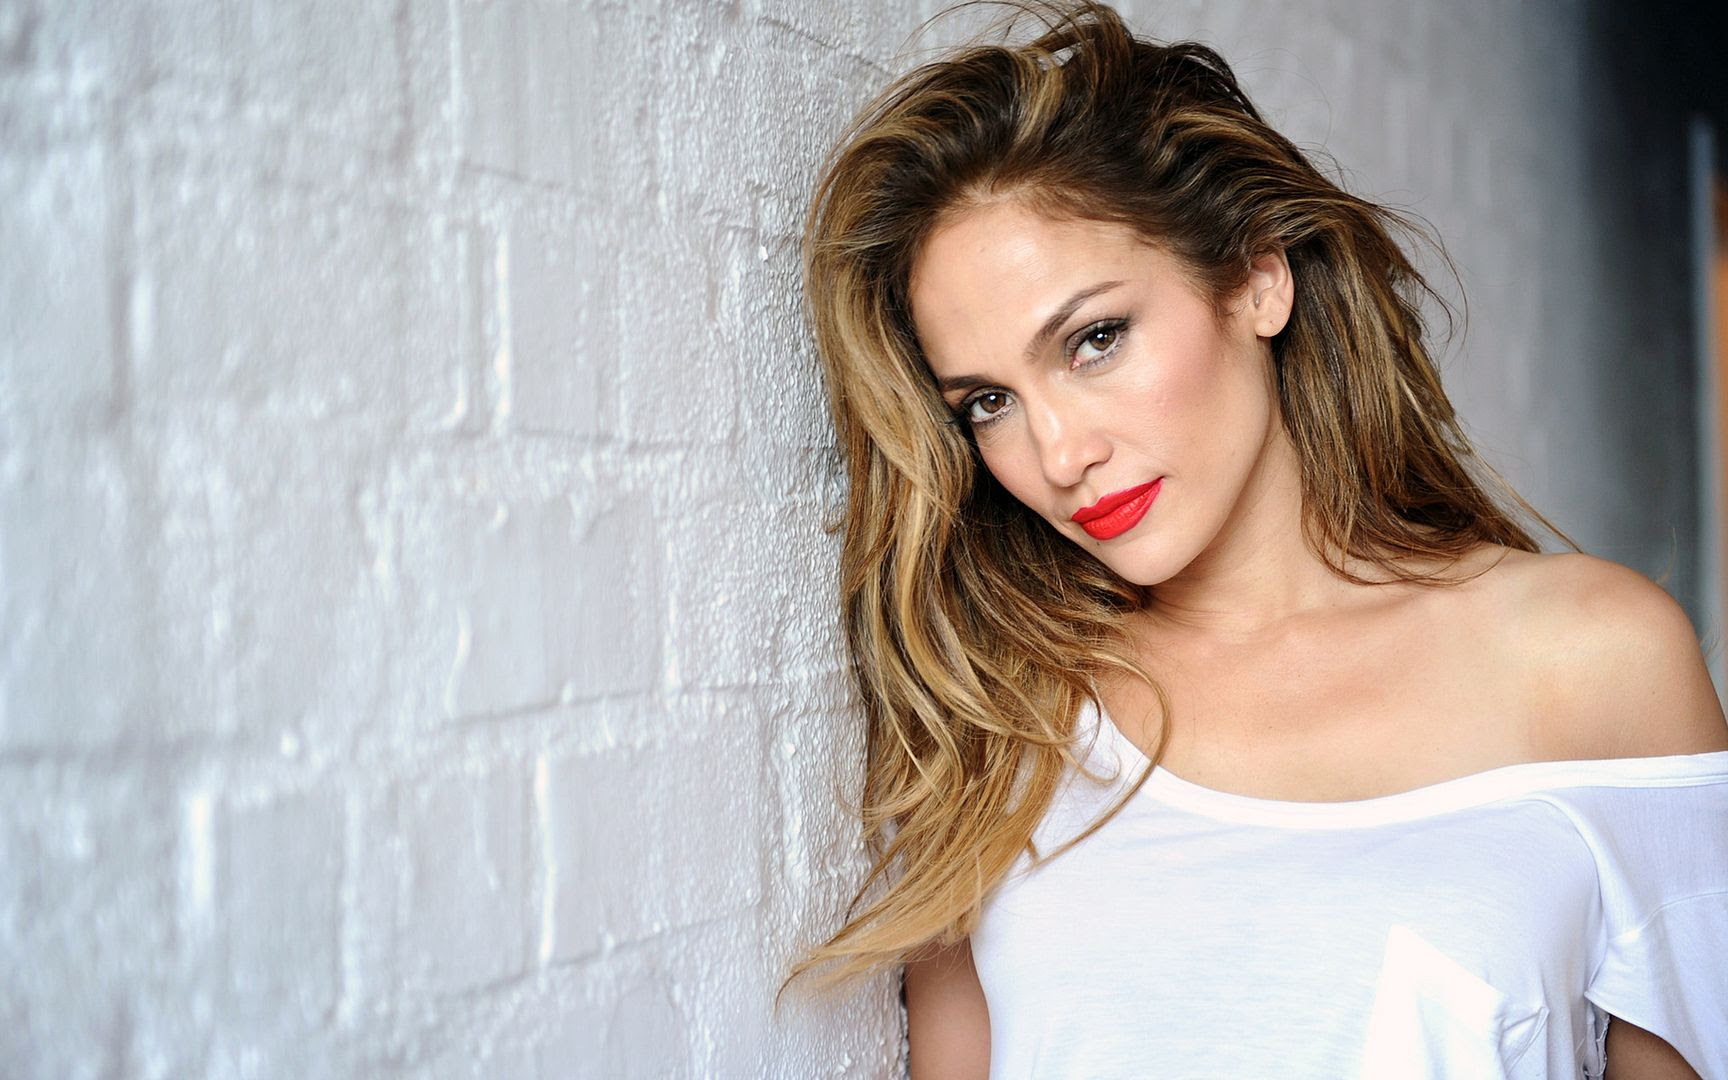 Jennifer Lopez photo jennifer-lopez-hd-wallpaper-widescreen-51a.jpg